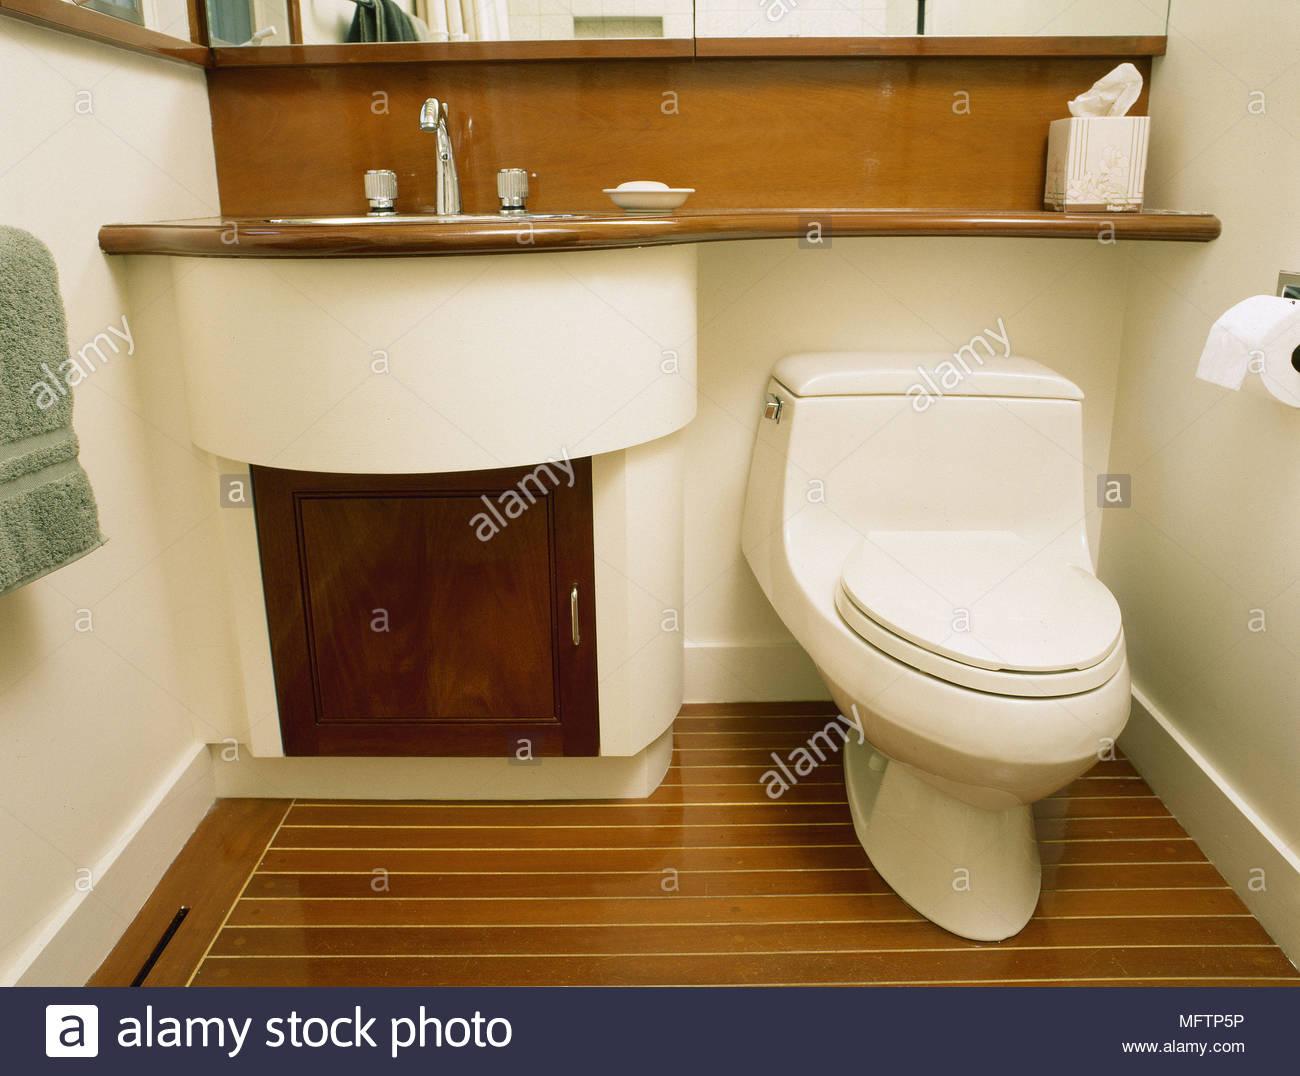 Modern Bathroom Detail Washbasin Set In Cupboard Unit Toilet Wood Floor